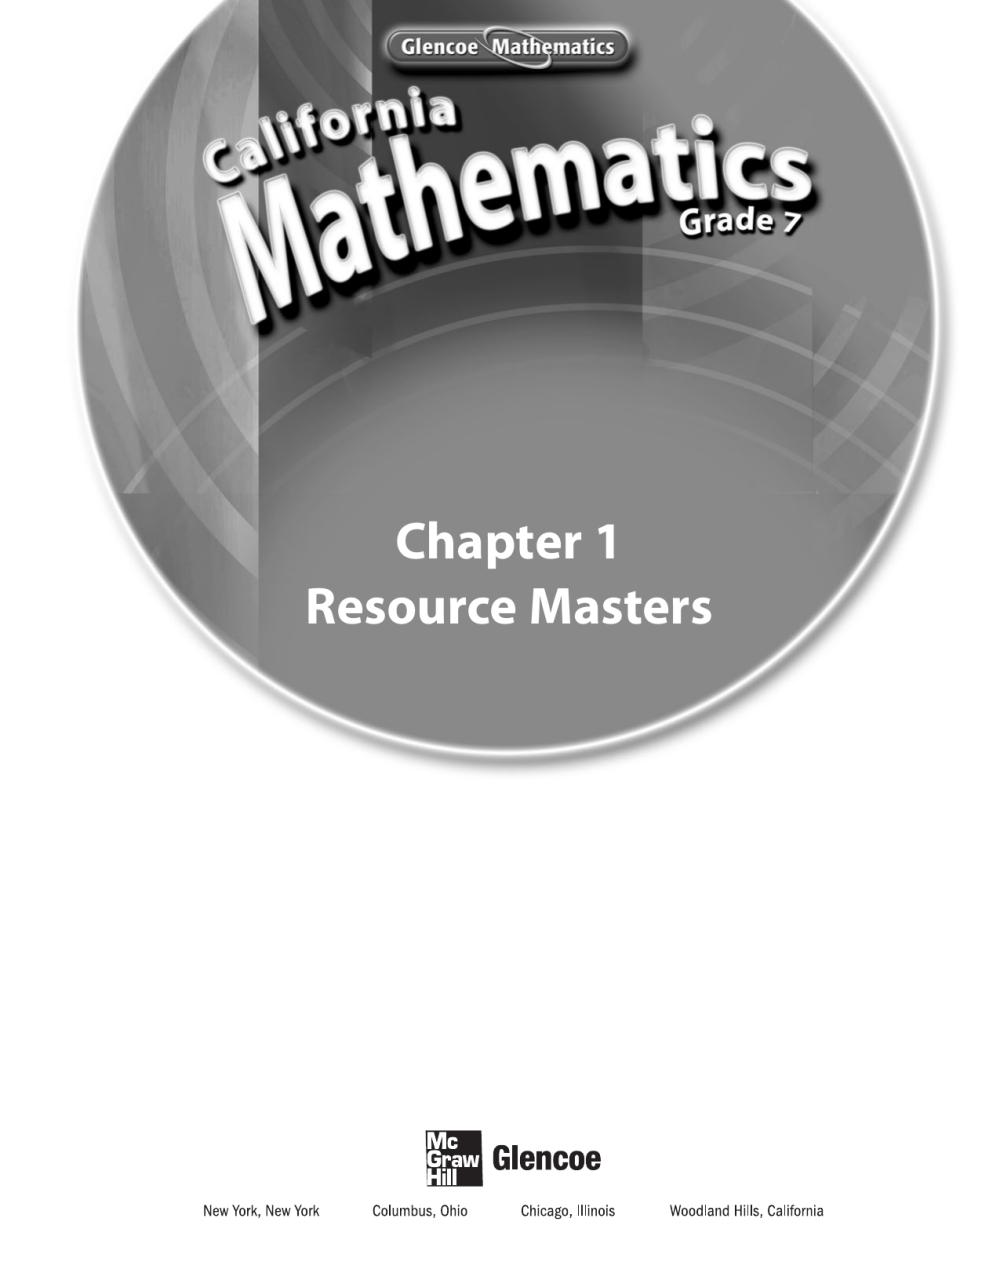 medium resolution of California Mathematics Grade 7 Resource Masters - Chapter 1